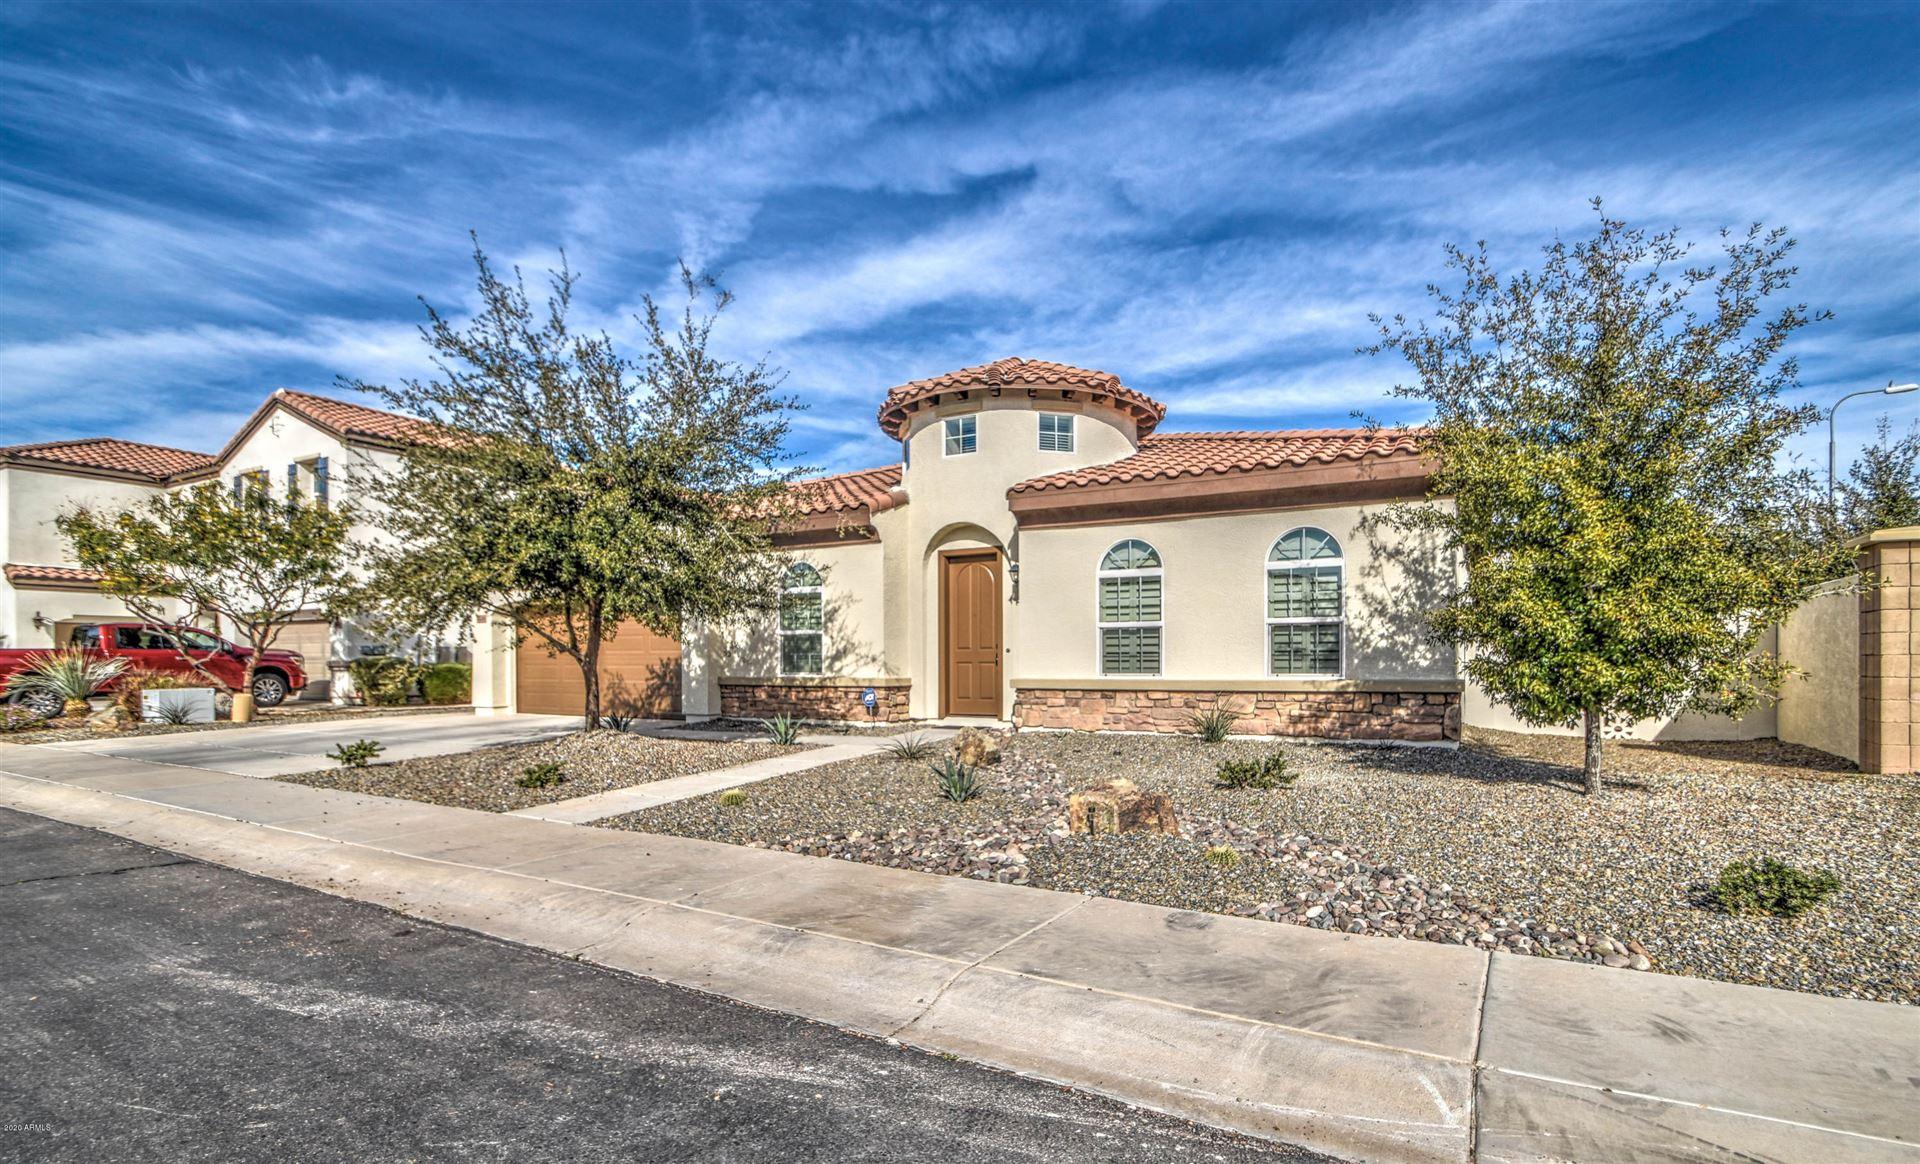 4224 E MEAD Way, Chandler, AZ 85249 - MLS#: 6028265